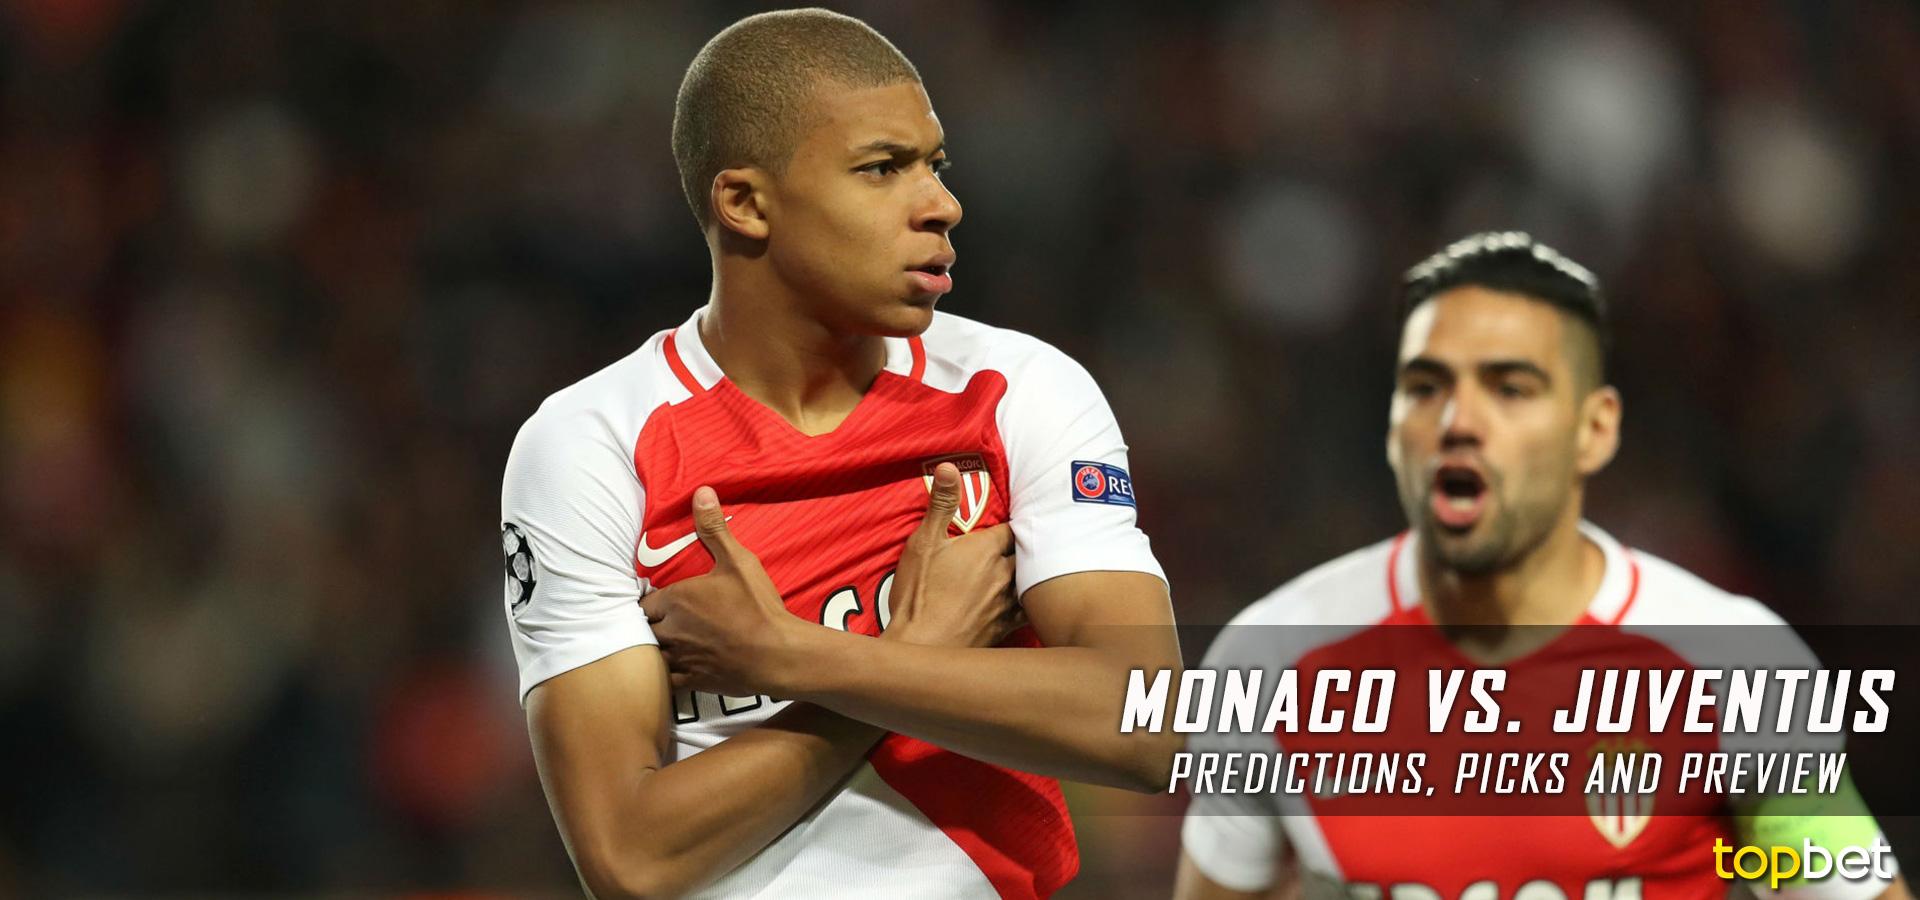 Monaco News: Monaco Vs Juventus Picks And Preview